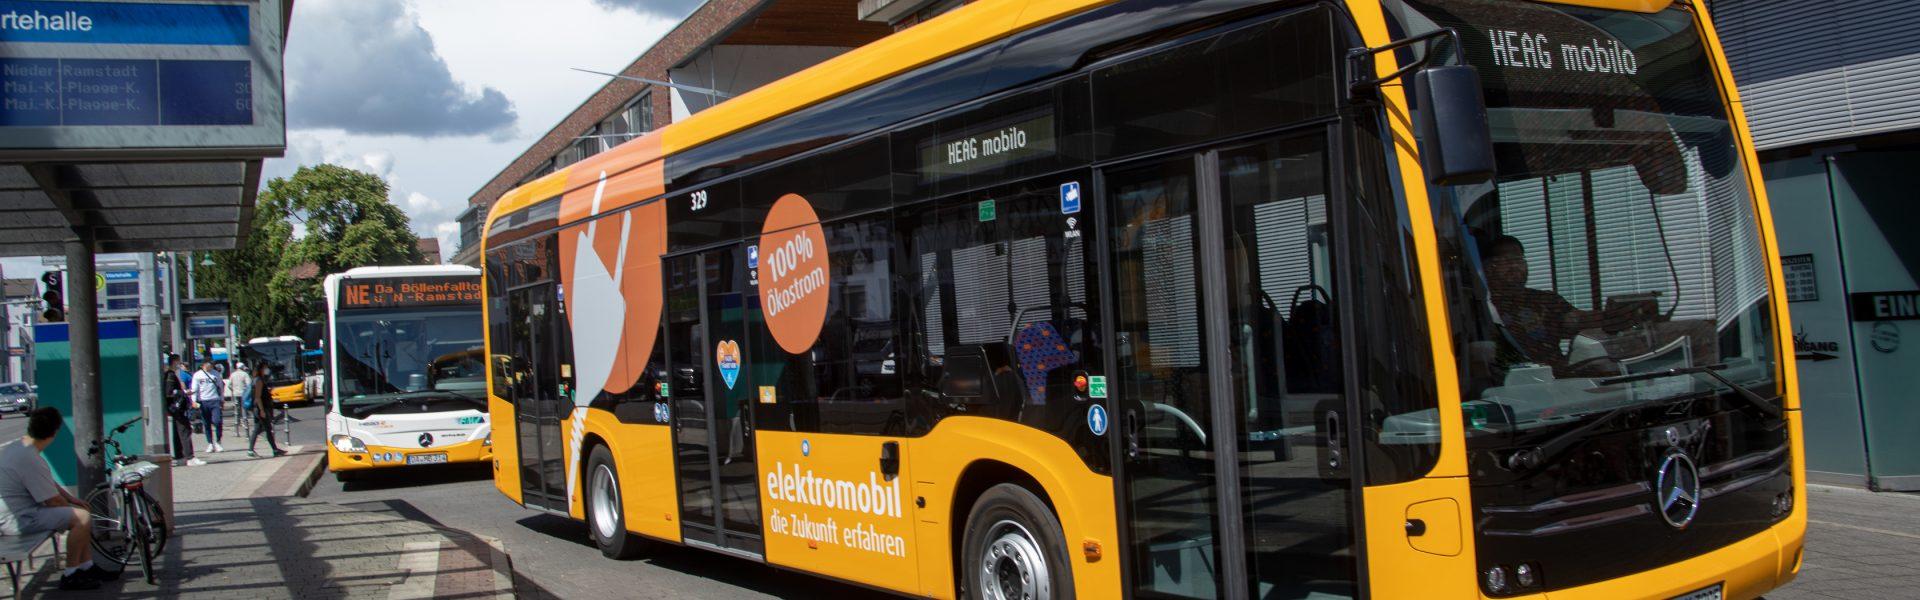 Header Bild HEAG mobilo nimmt sechs Elektrobusse in Betrieb